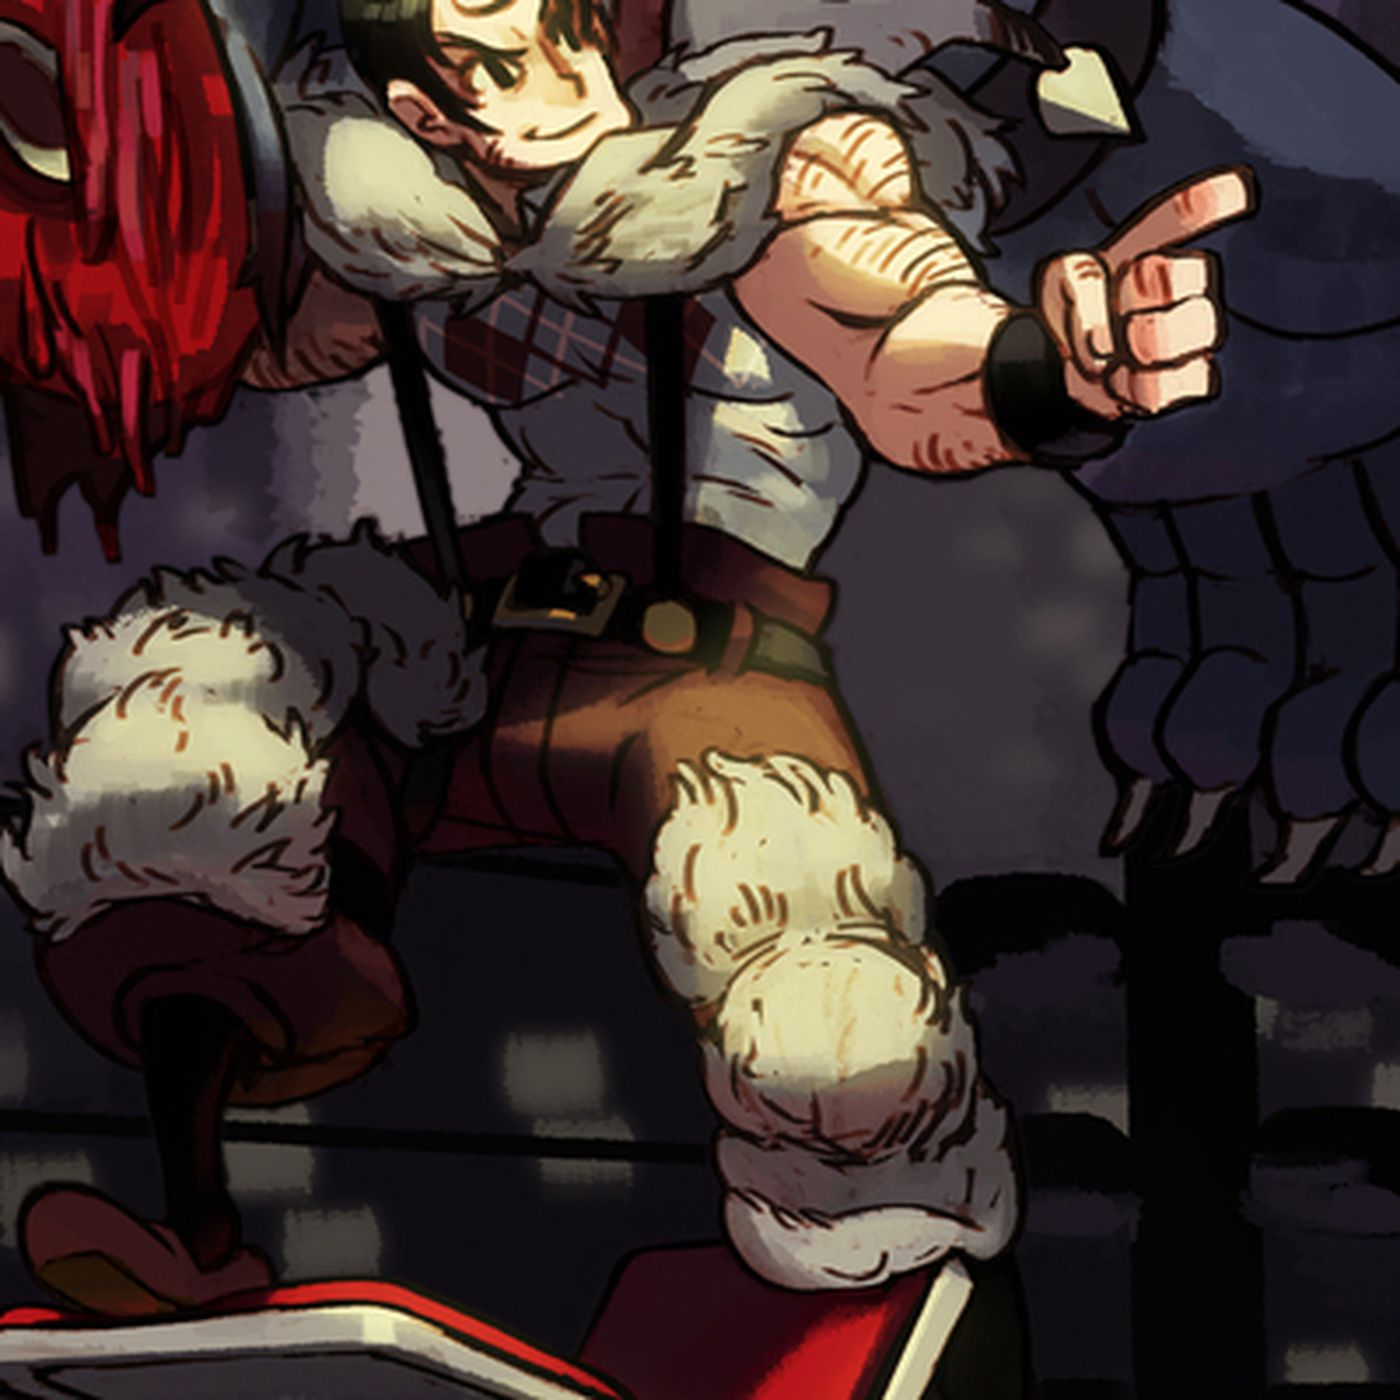 Skullgirls Final Dlc Character Is Macho Man Randy Savage Inspired